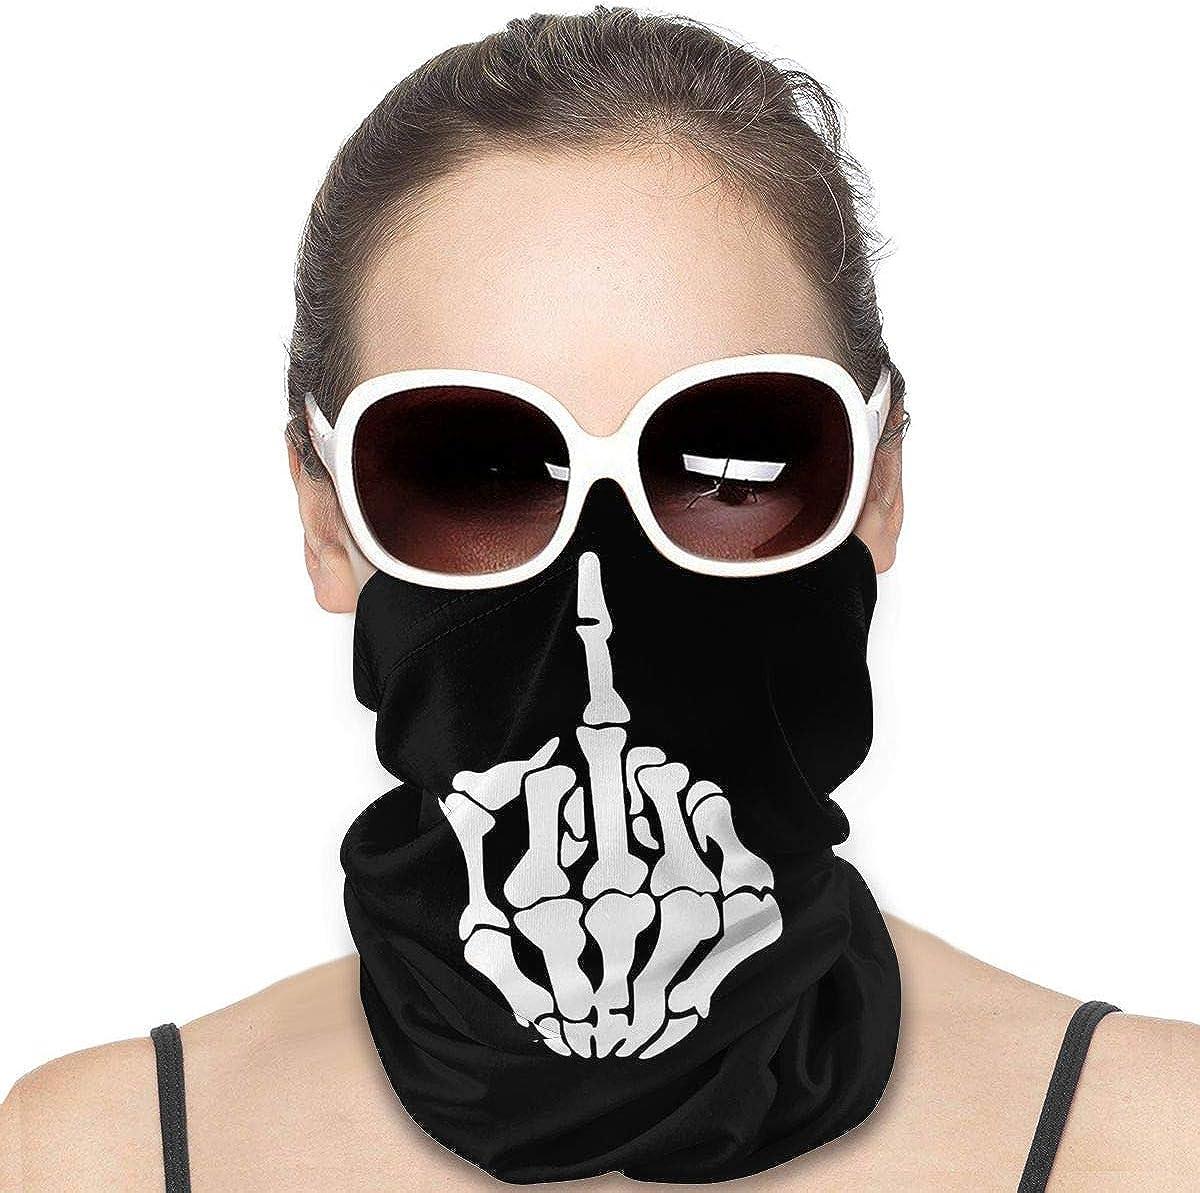 JinSPef Motorcycle Masks for Men - Fuck Off Rude Gesture Motorcycle Mask Bandana Face Mask Neck Gaiter Head Bands Sport Mask Headwear Neck Gaiter